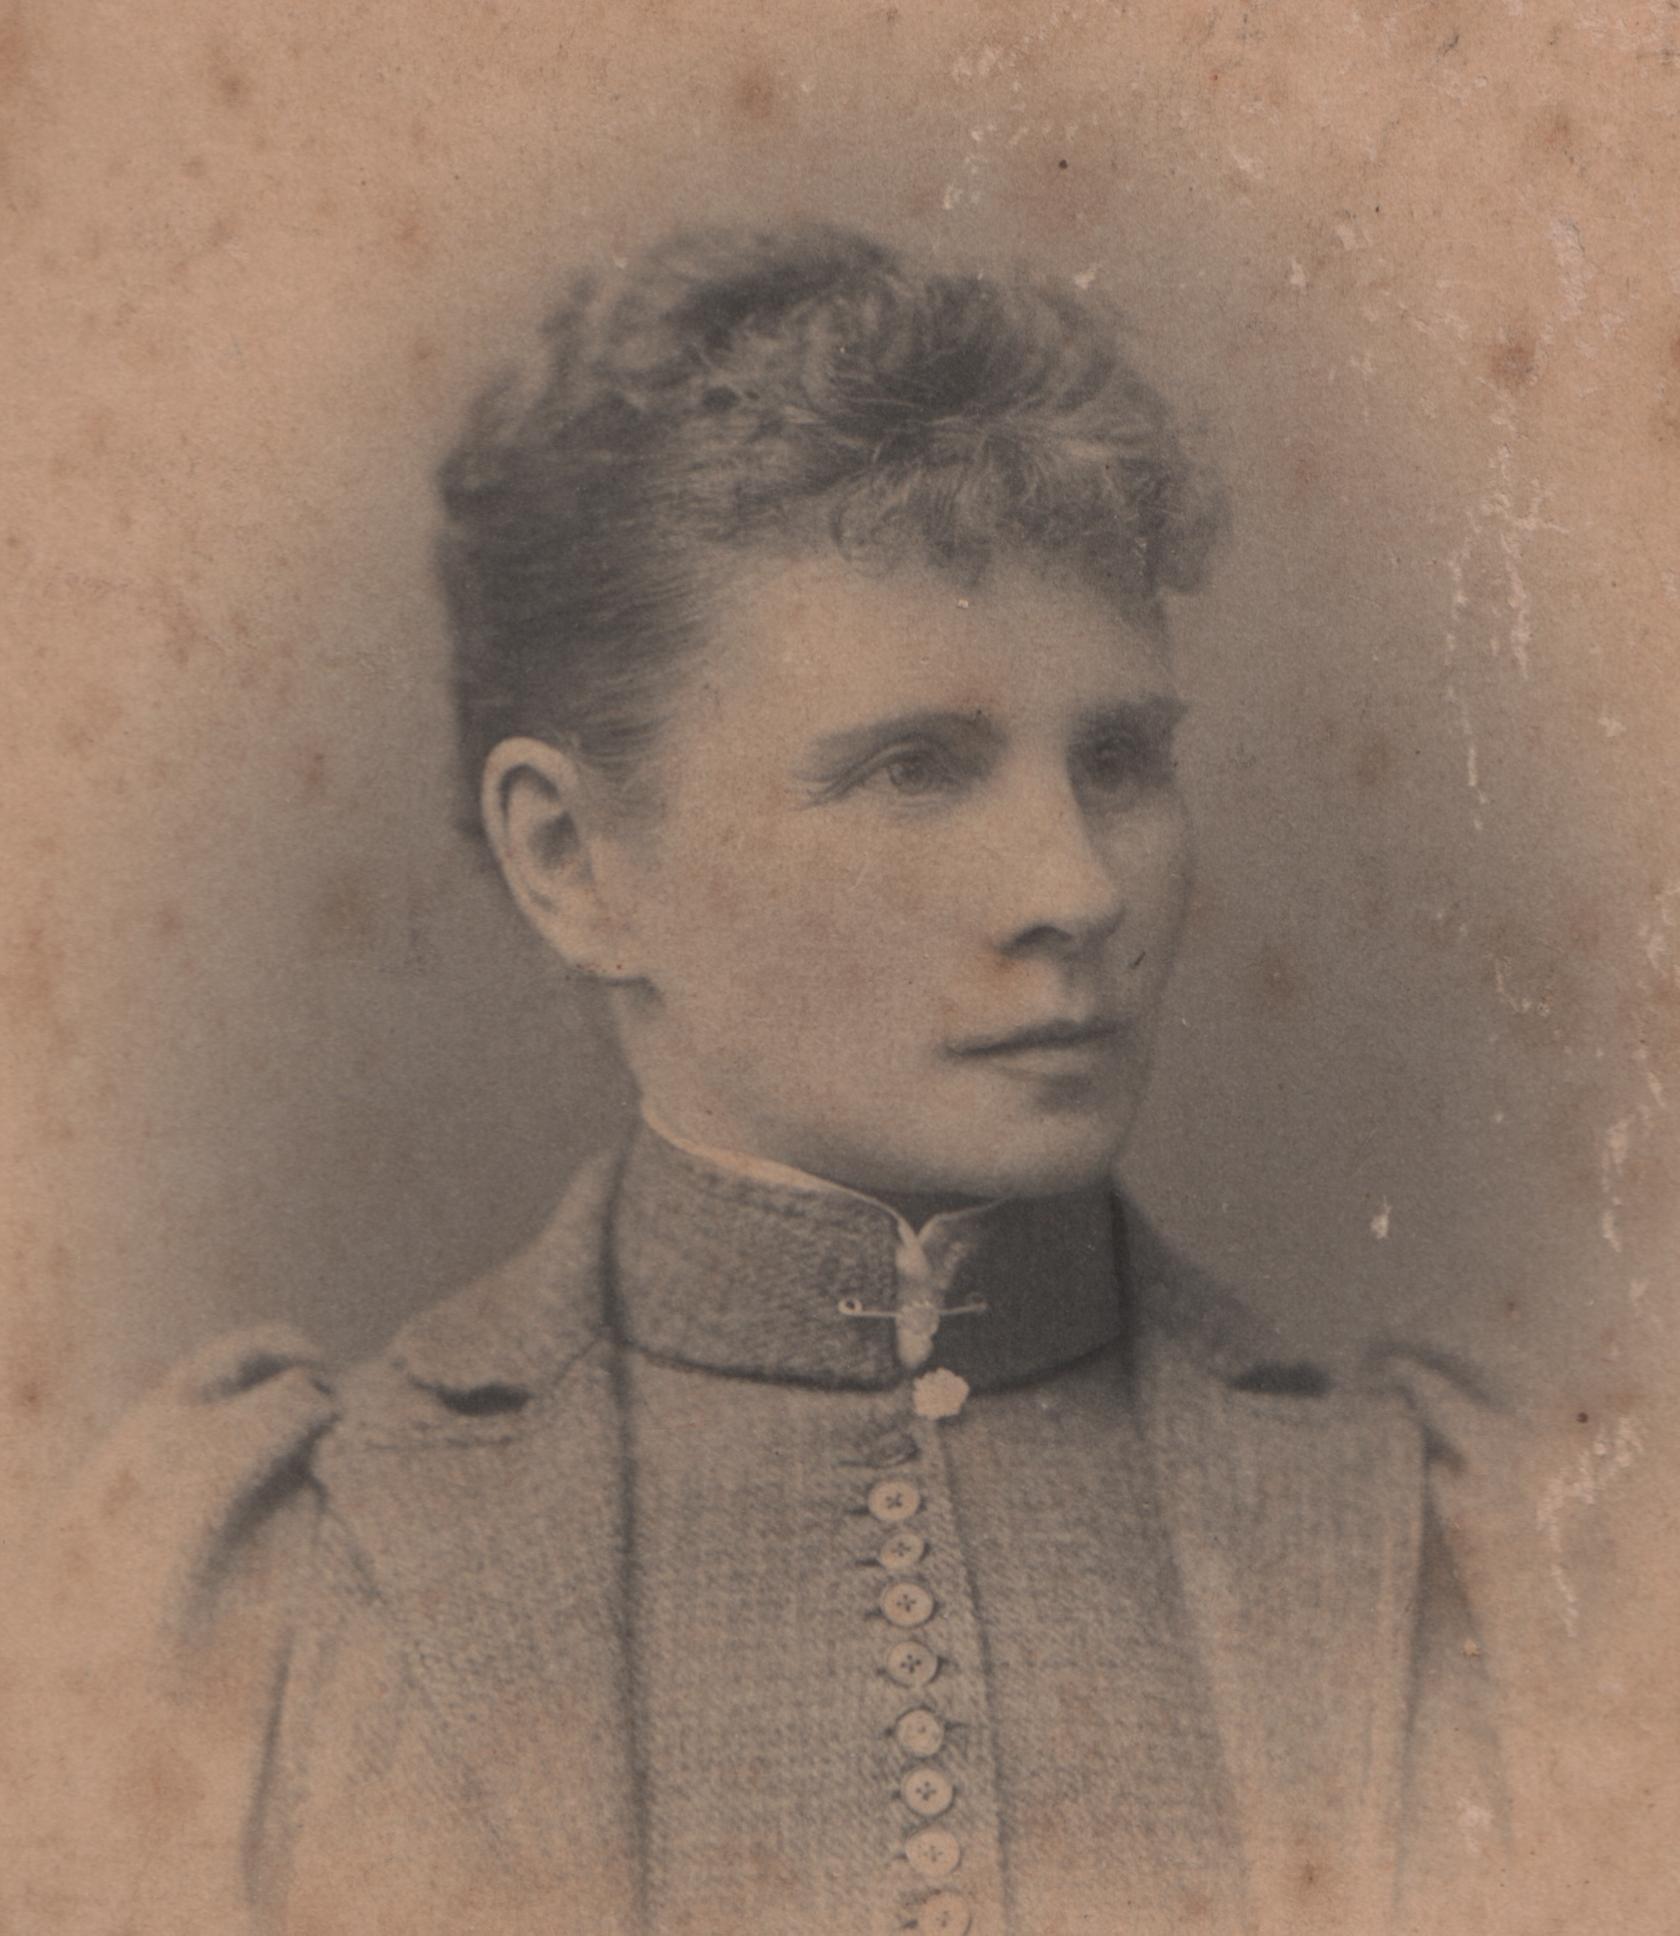 George Keith Maitland and Christina Mary Theresa McDonell - christina-mary-theresa-maitland-1880